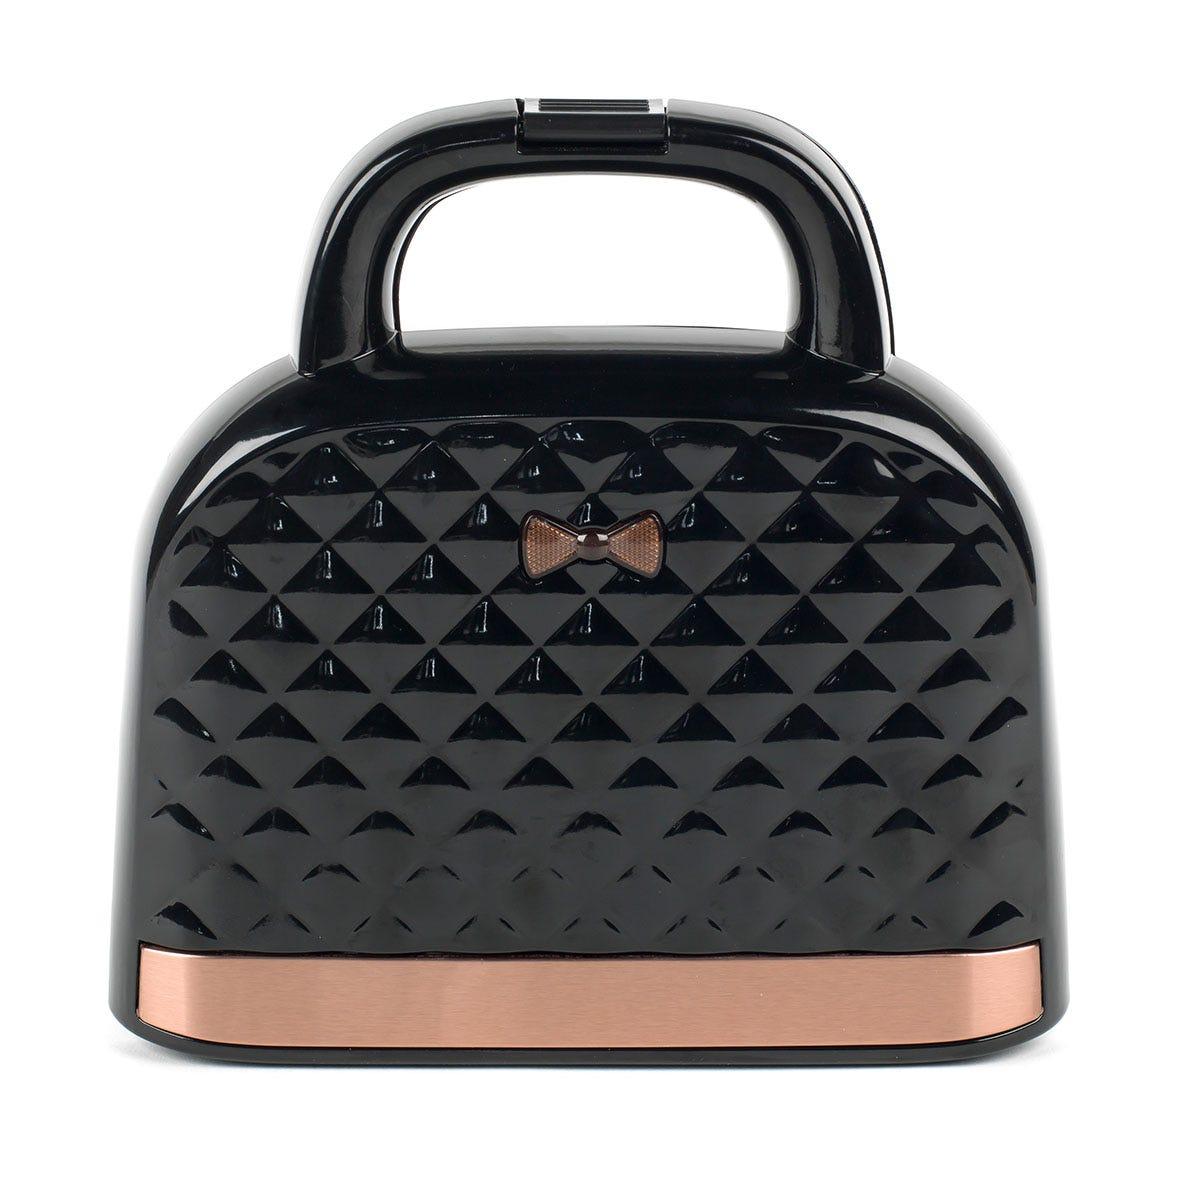 Salter EK3677 Handbag Style 2-Slice 750W Sandwich Toaster - Black and Rose Gold